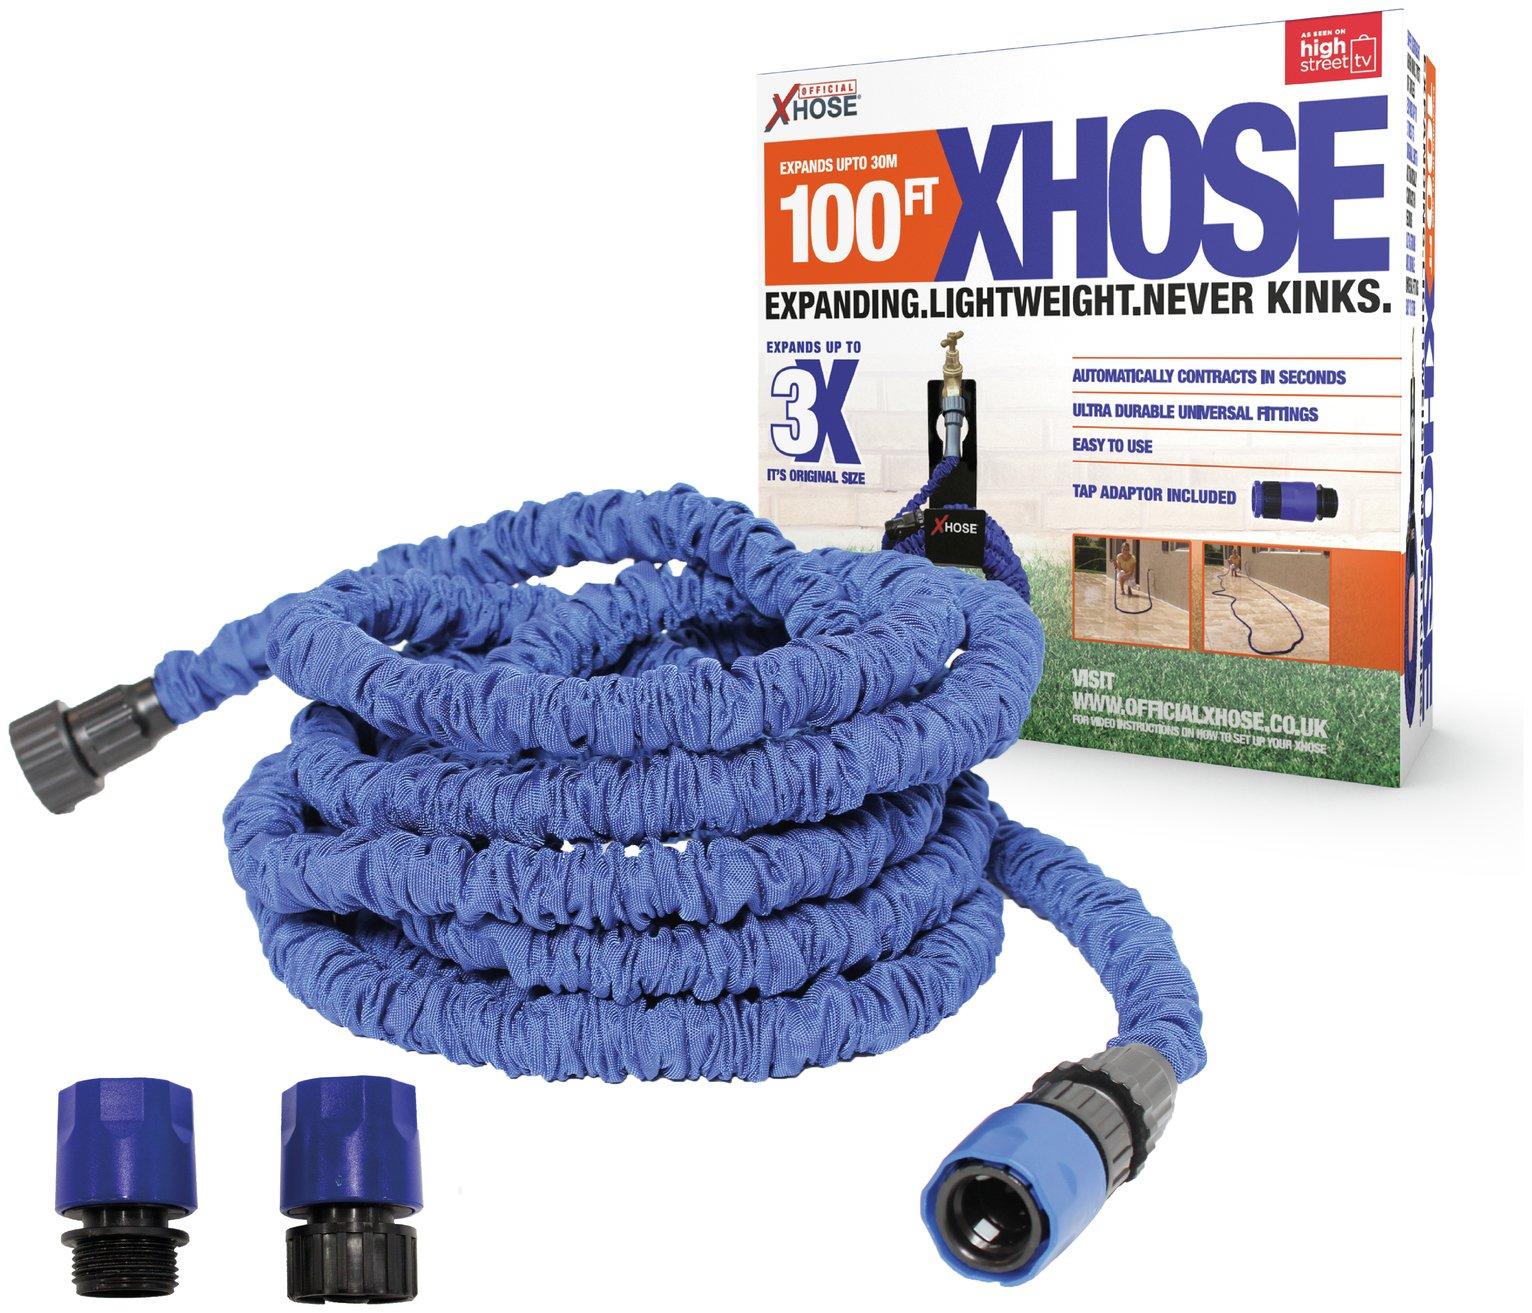 XHose Expandable Hose - 100ft